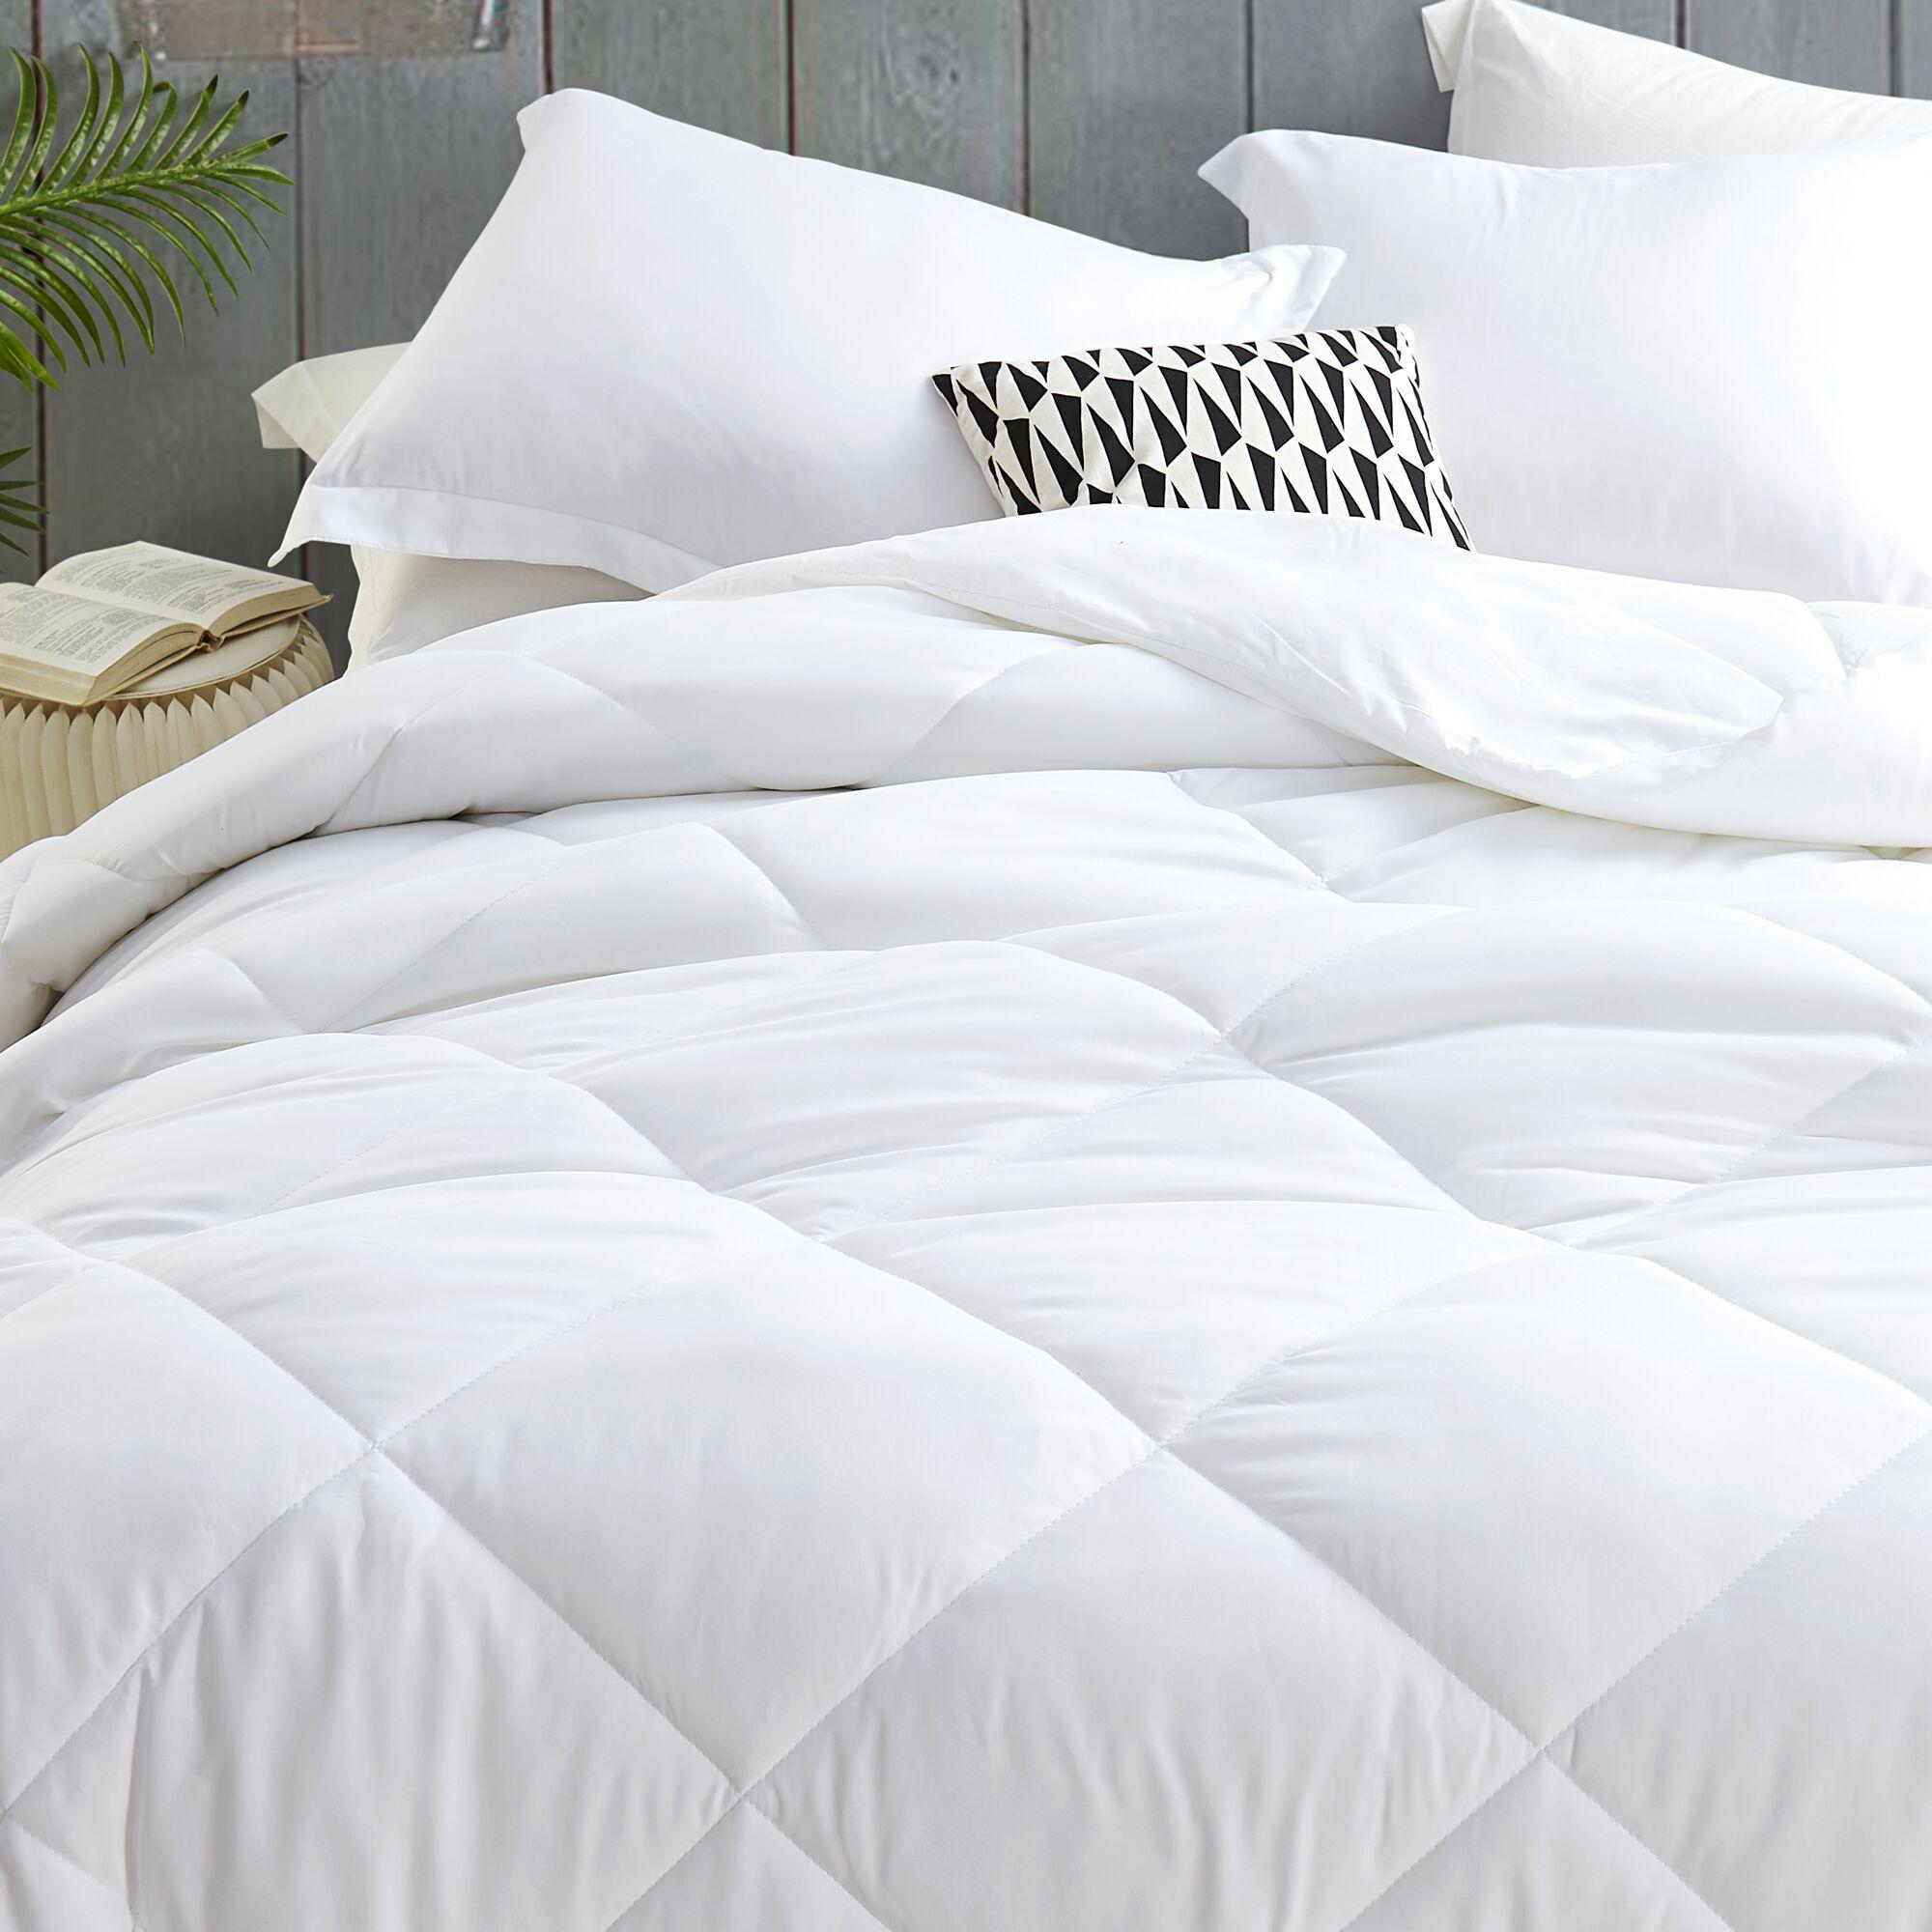 Ultra Cozy Down Alternative Duvet Insert Bed Size: King XL (112